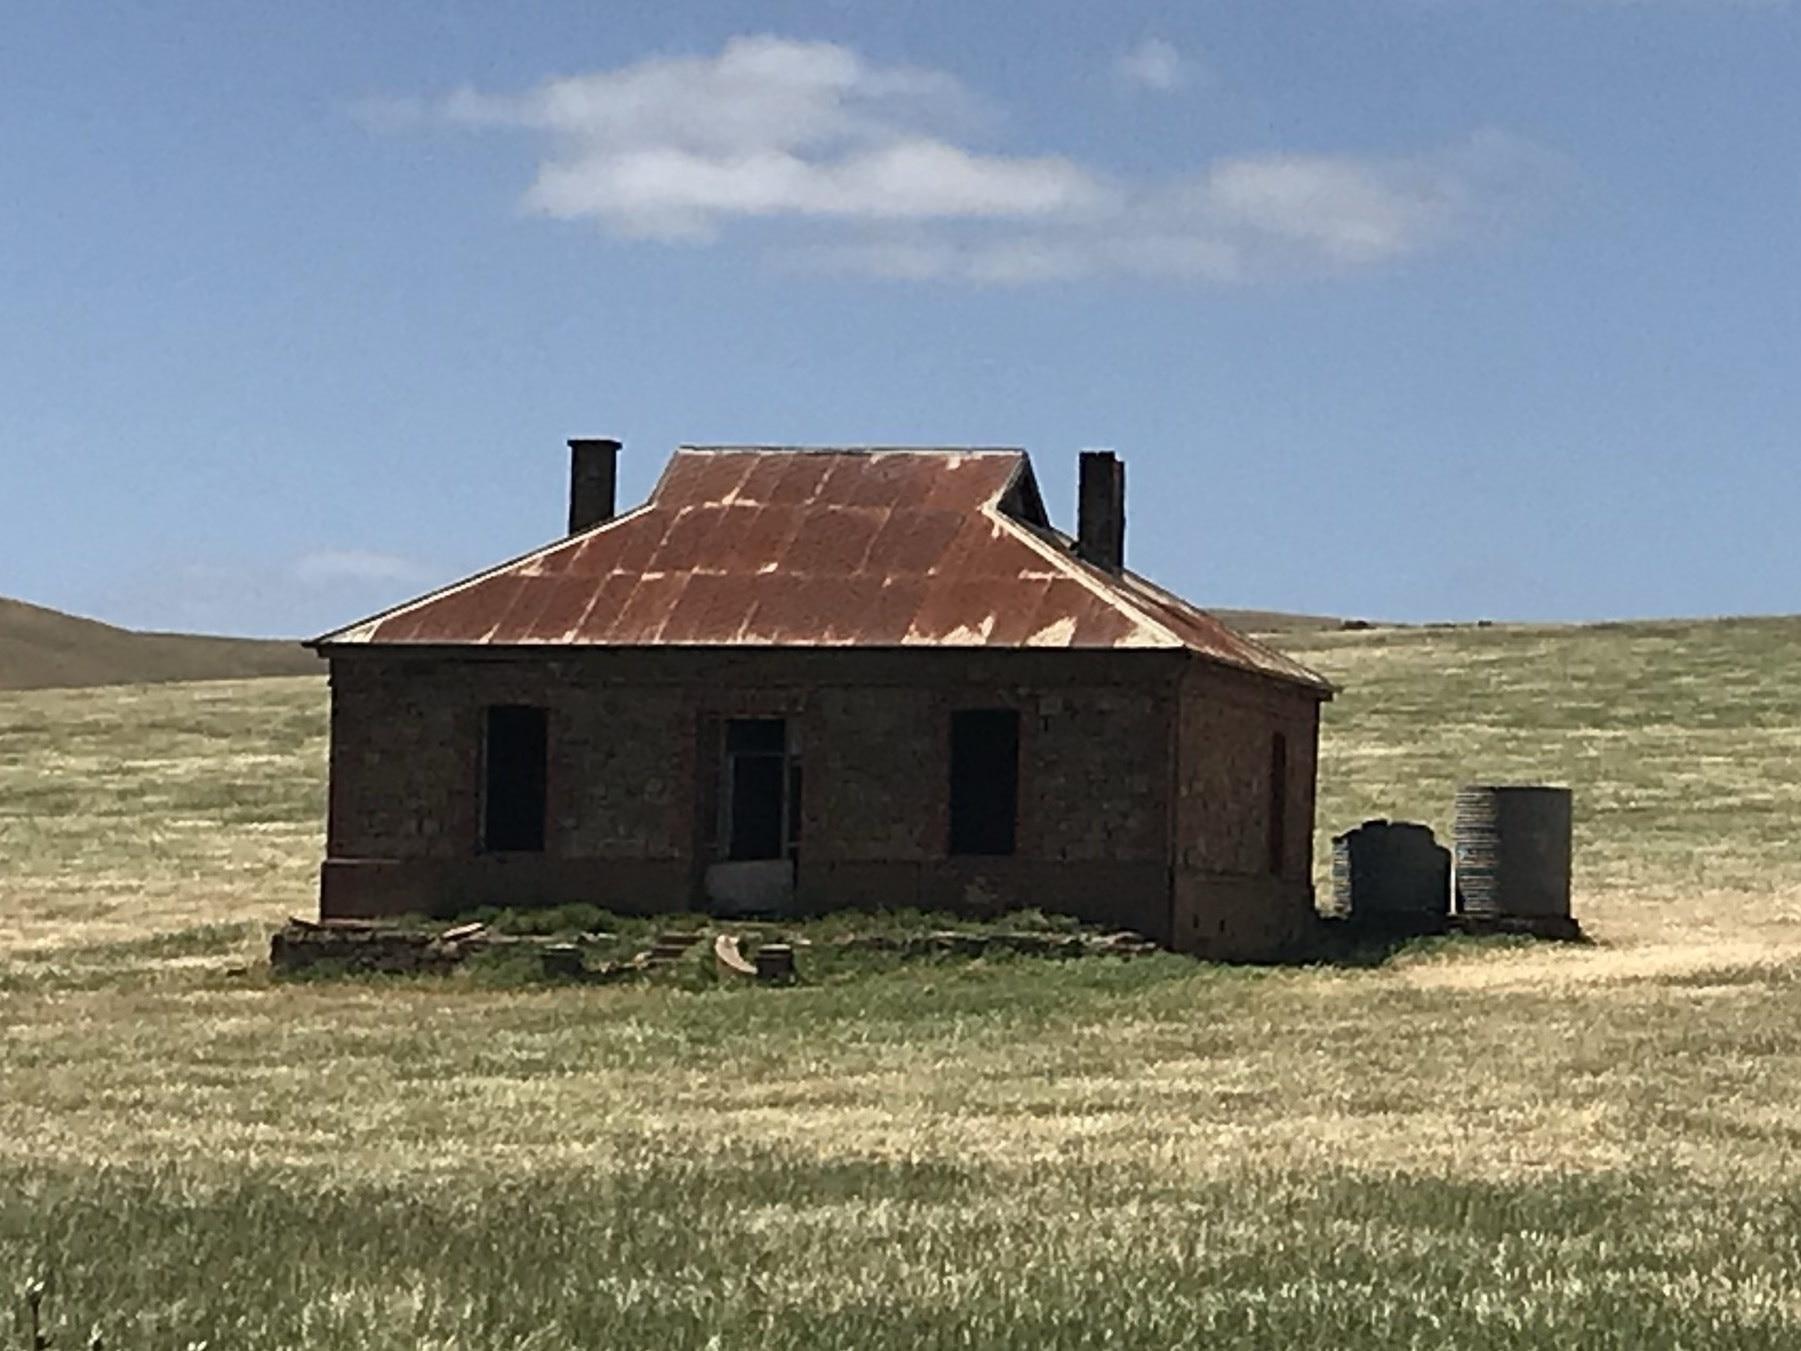 Burra, South Australia, Australia